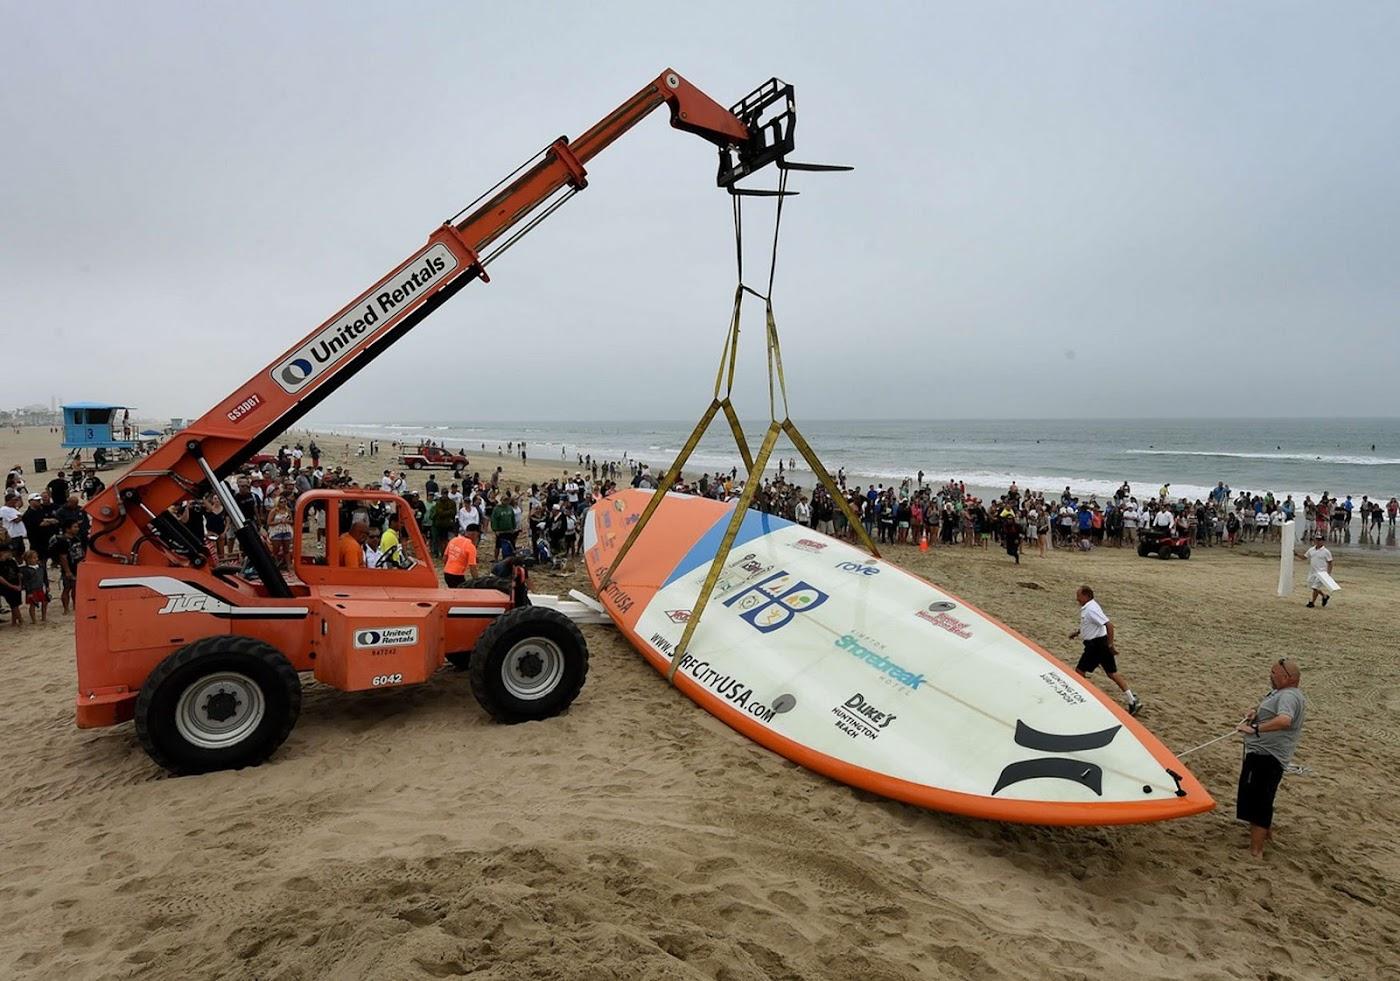 Worlds largest surfboard 05